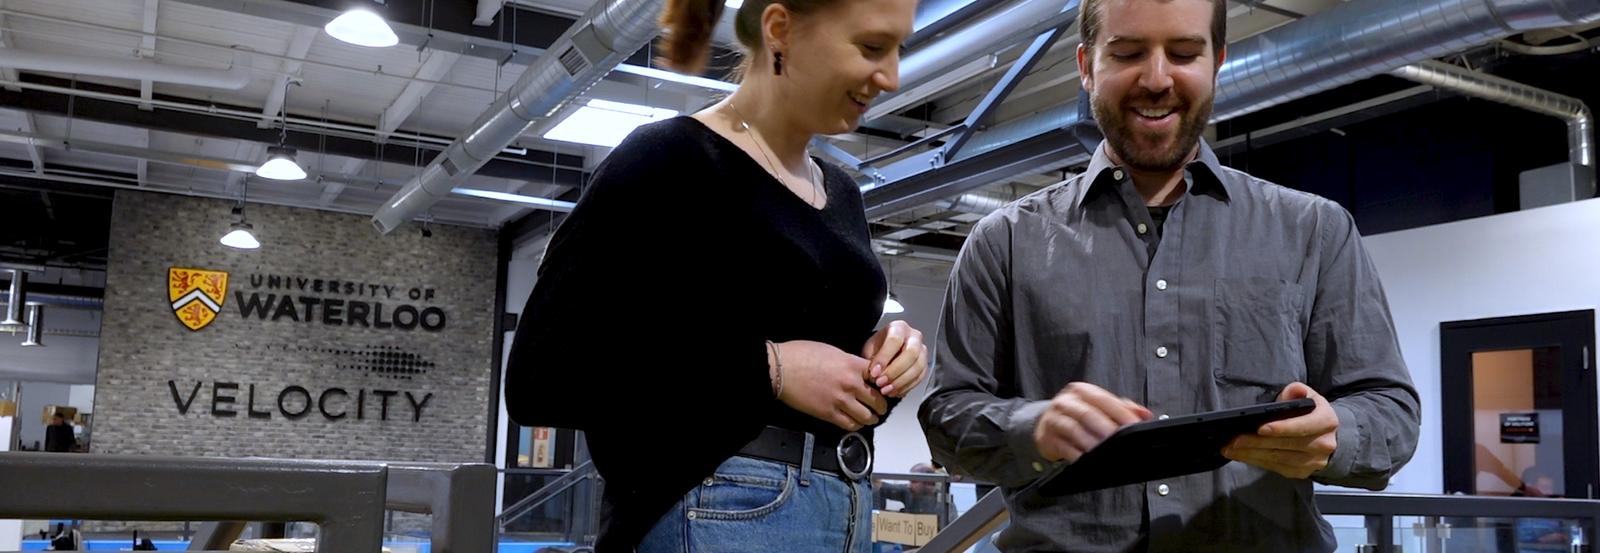 Mr Harris showing a woman an ipad